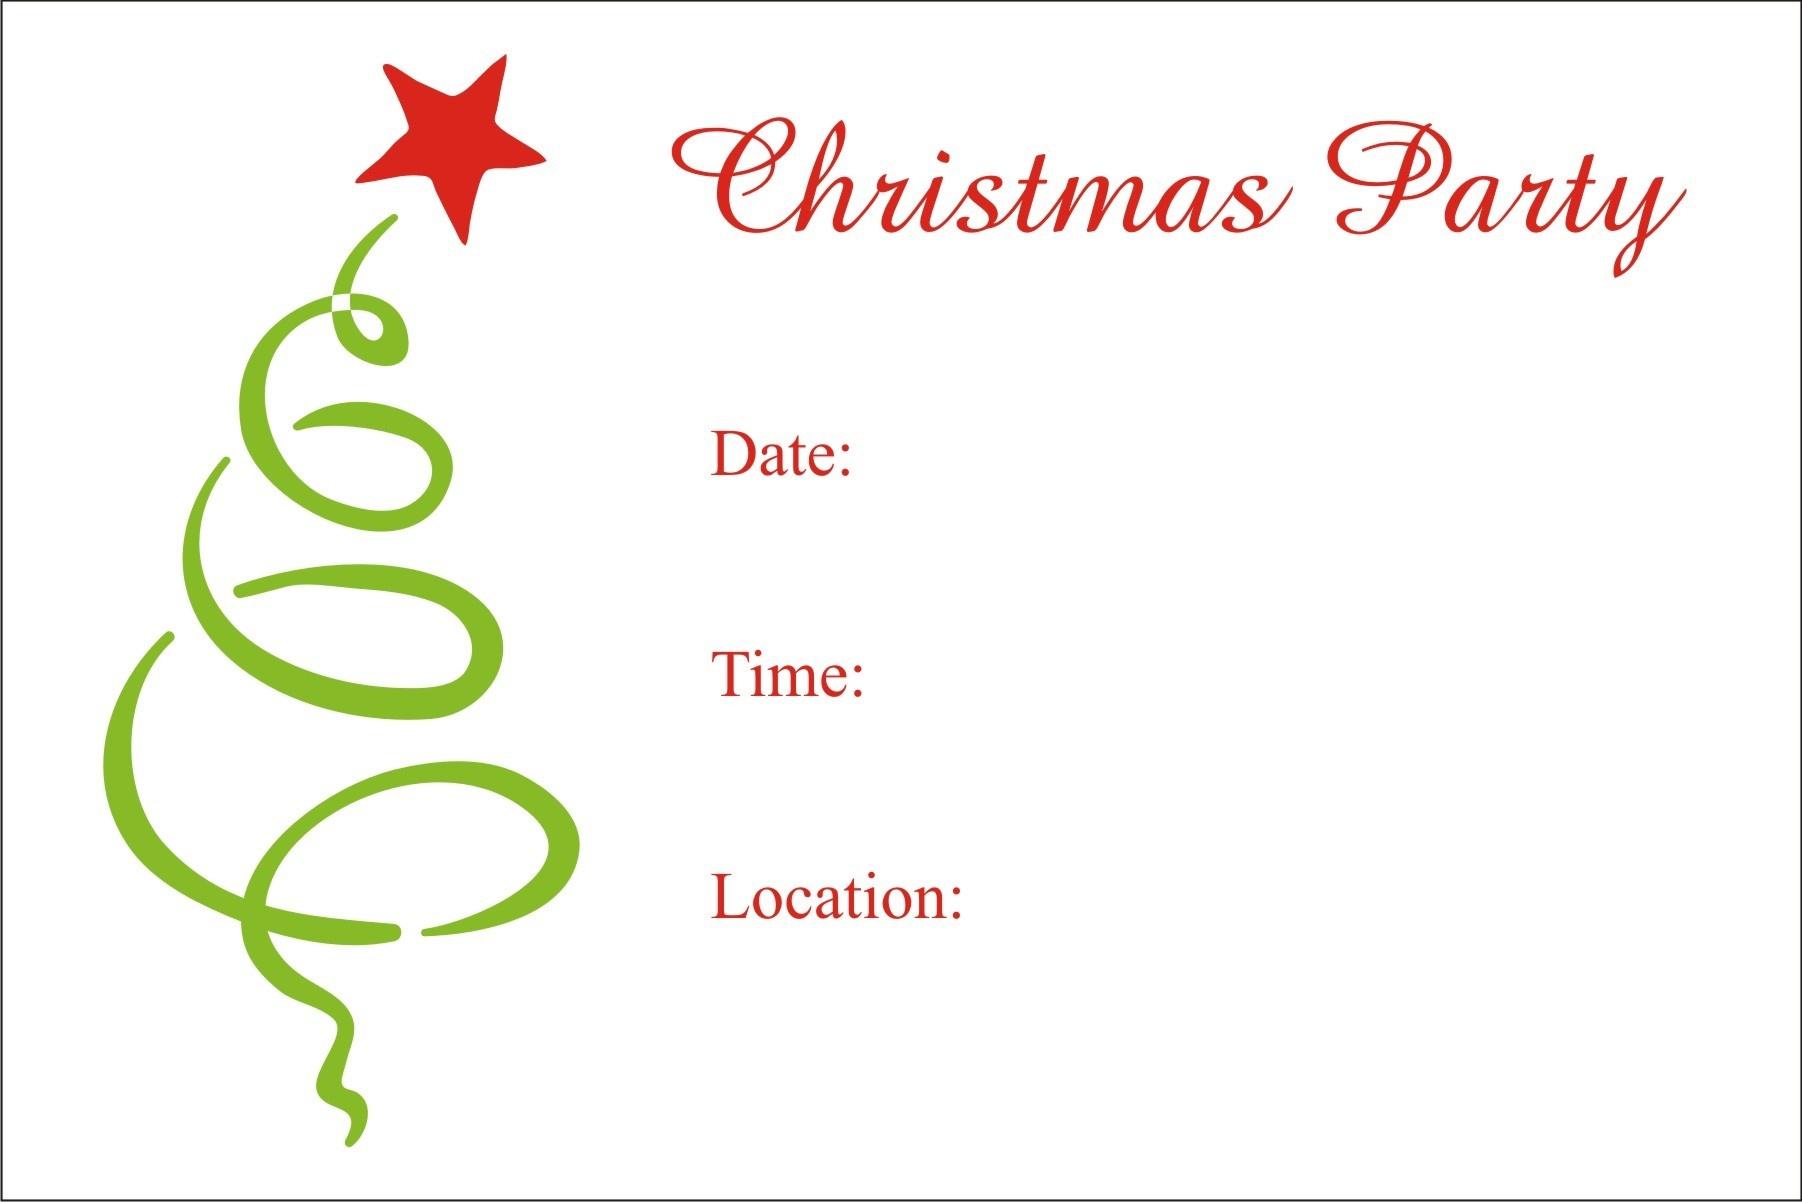 Christmas Party Free Printable Holiday Invitation Personalized Party - Holiday Invitations Free Printable